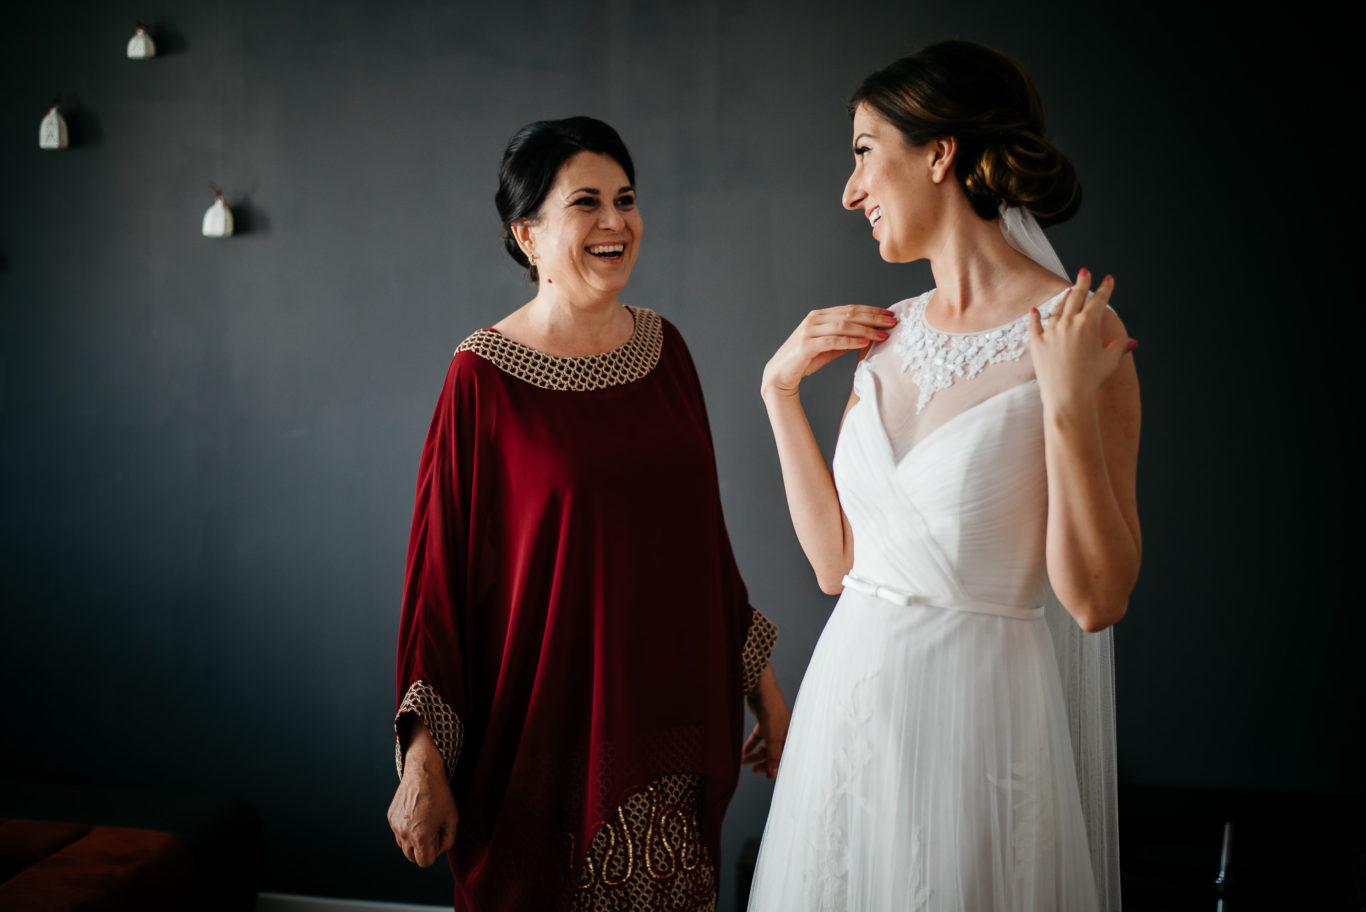 0139-Fotografie-nunta-Bucuresti-Oana-Catalin-fotograf-Ciprian-Dumitrescu-DSC_3717